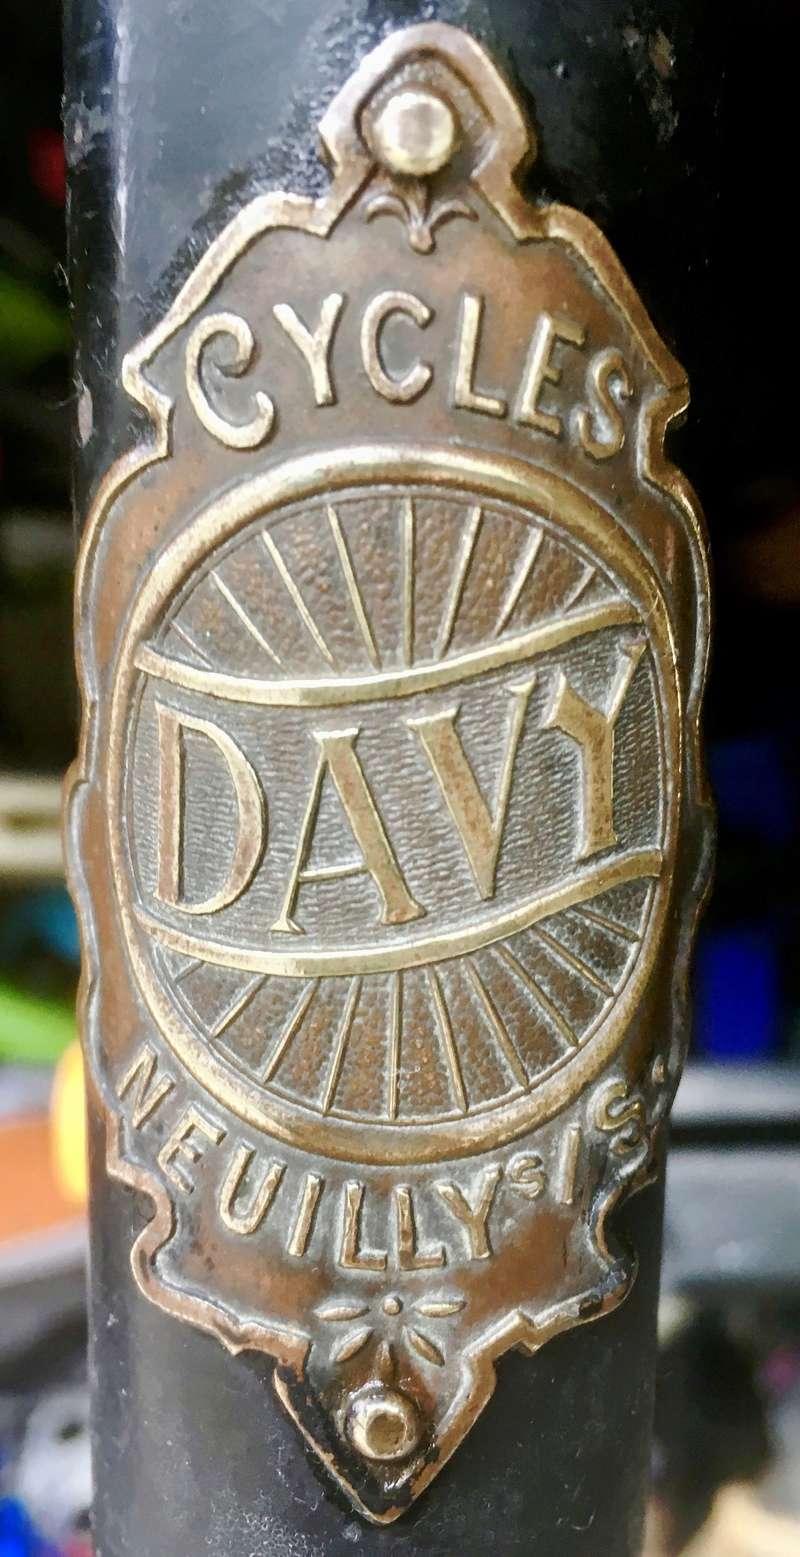 Davy de Neuilly Fullsi12